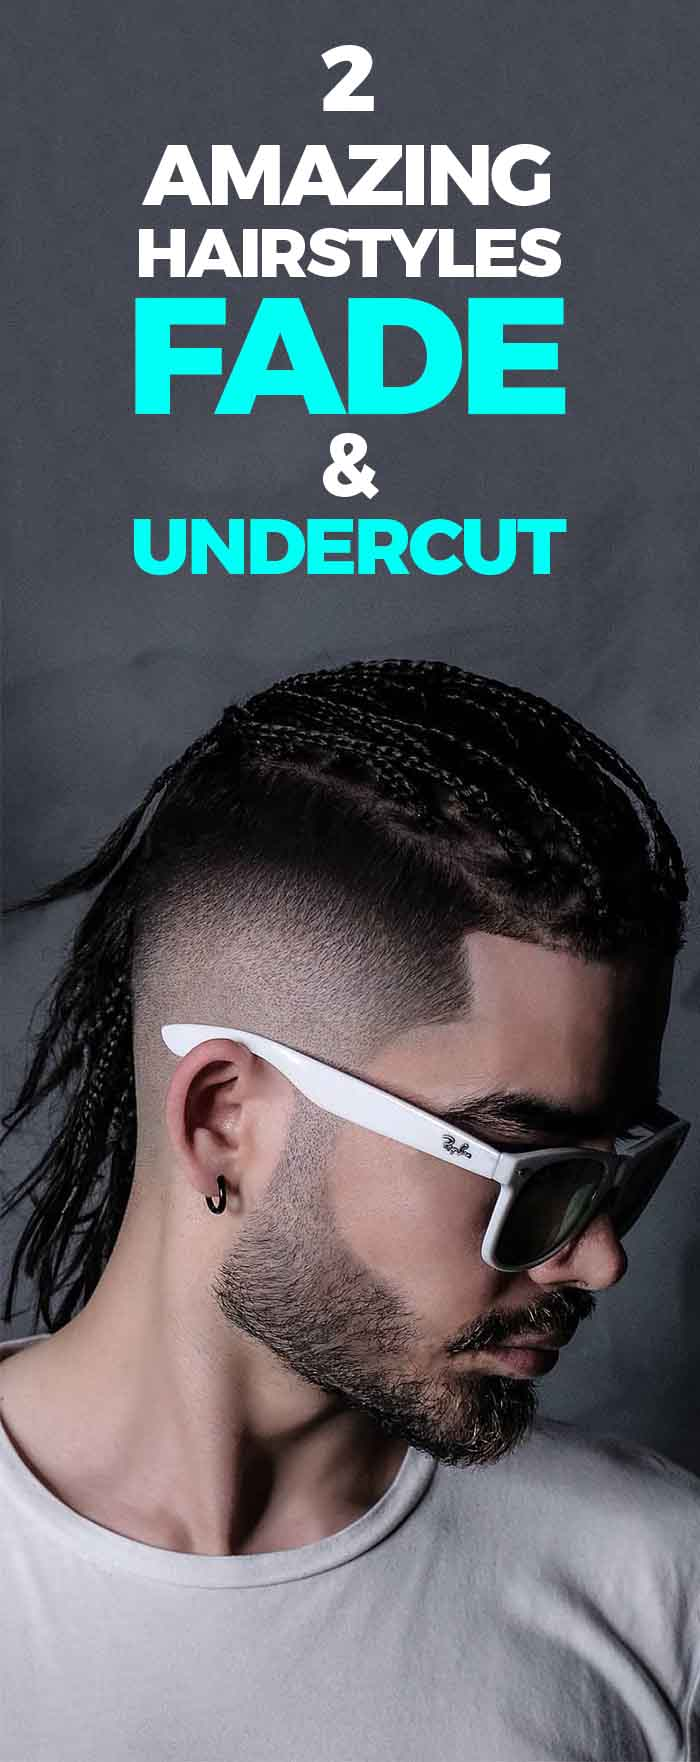 Fade & Undercut Hairstyles.